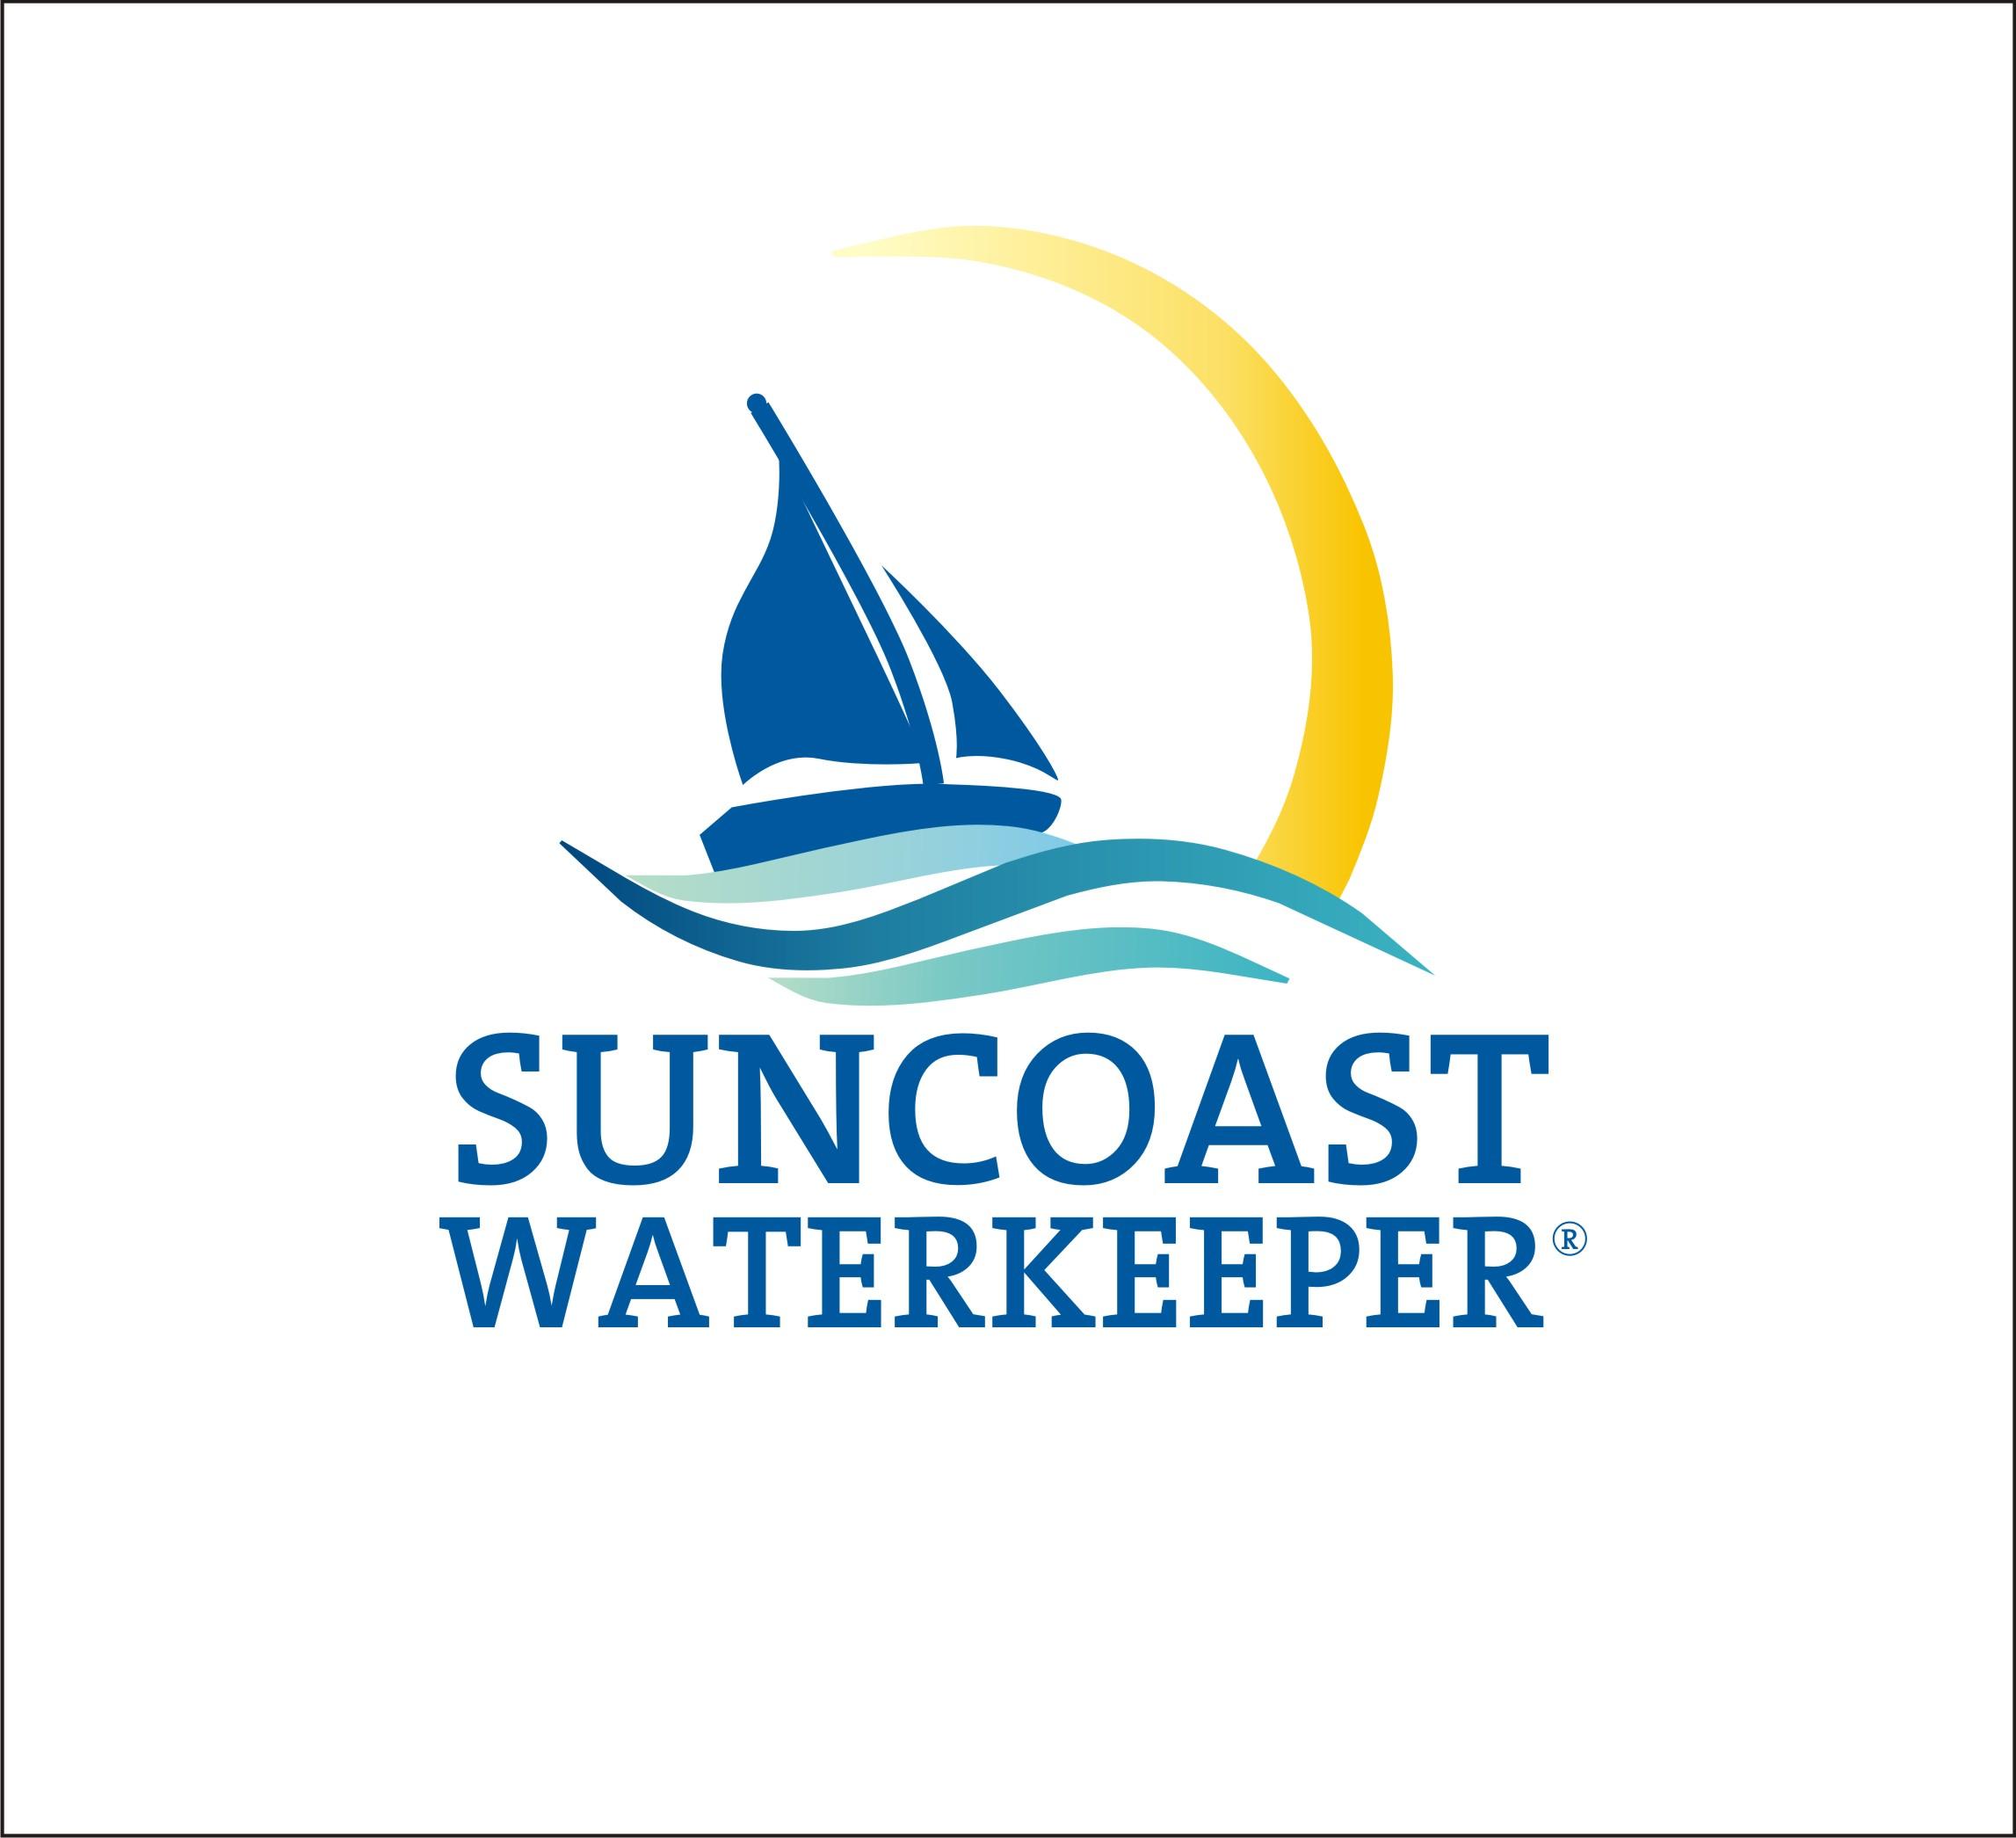 Suncoast_Waterkeeper_FinalWOS